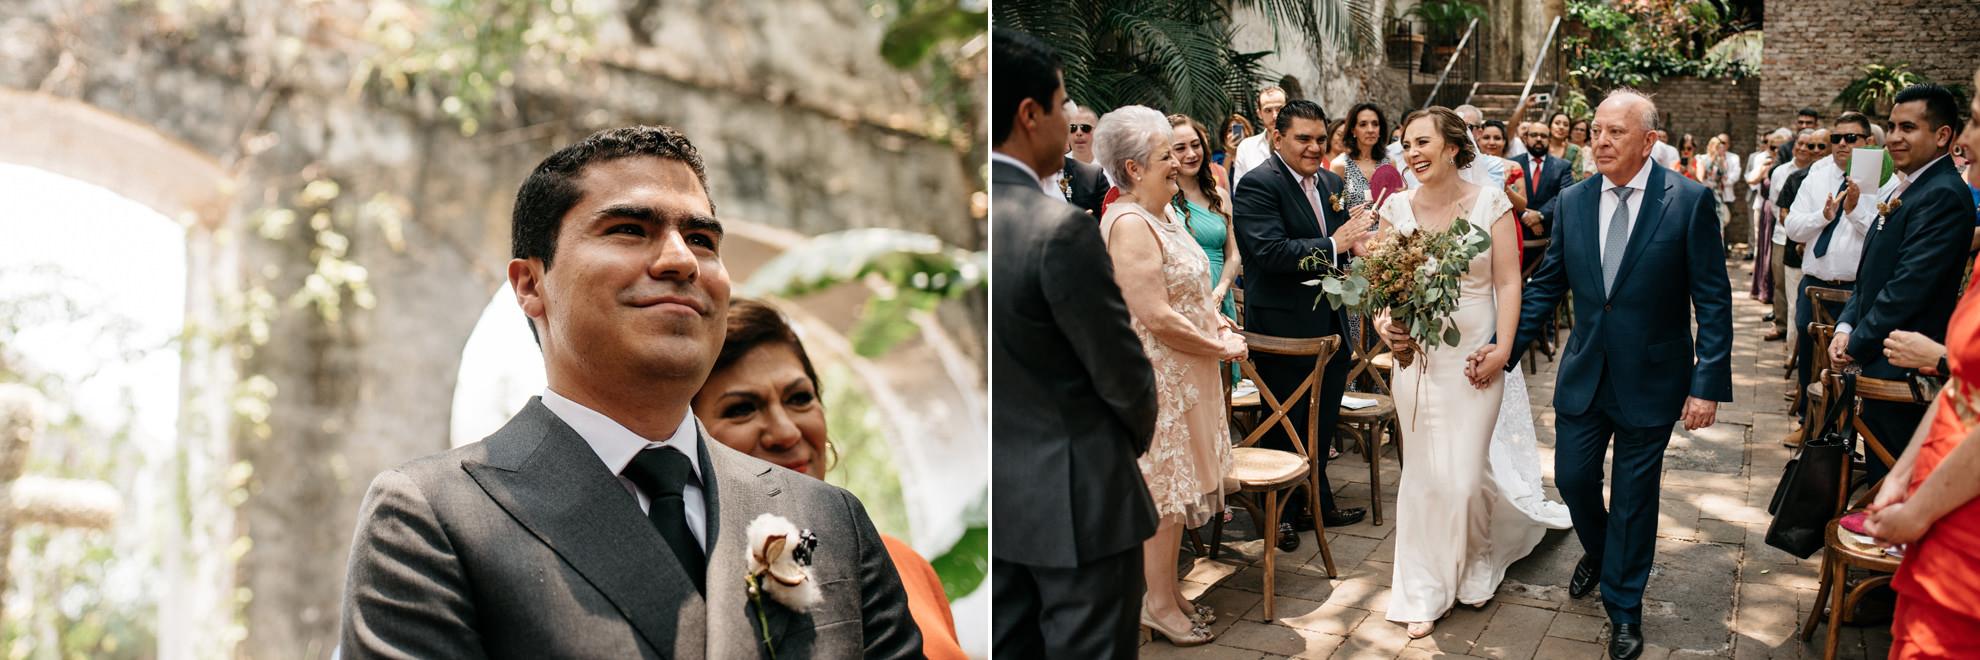 035 - wedding hacienda san carlos.jpg